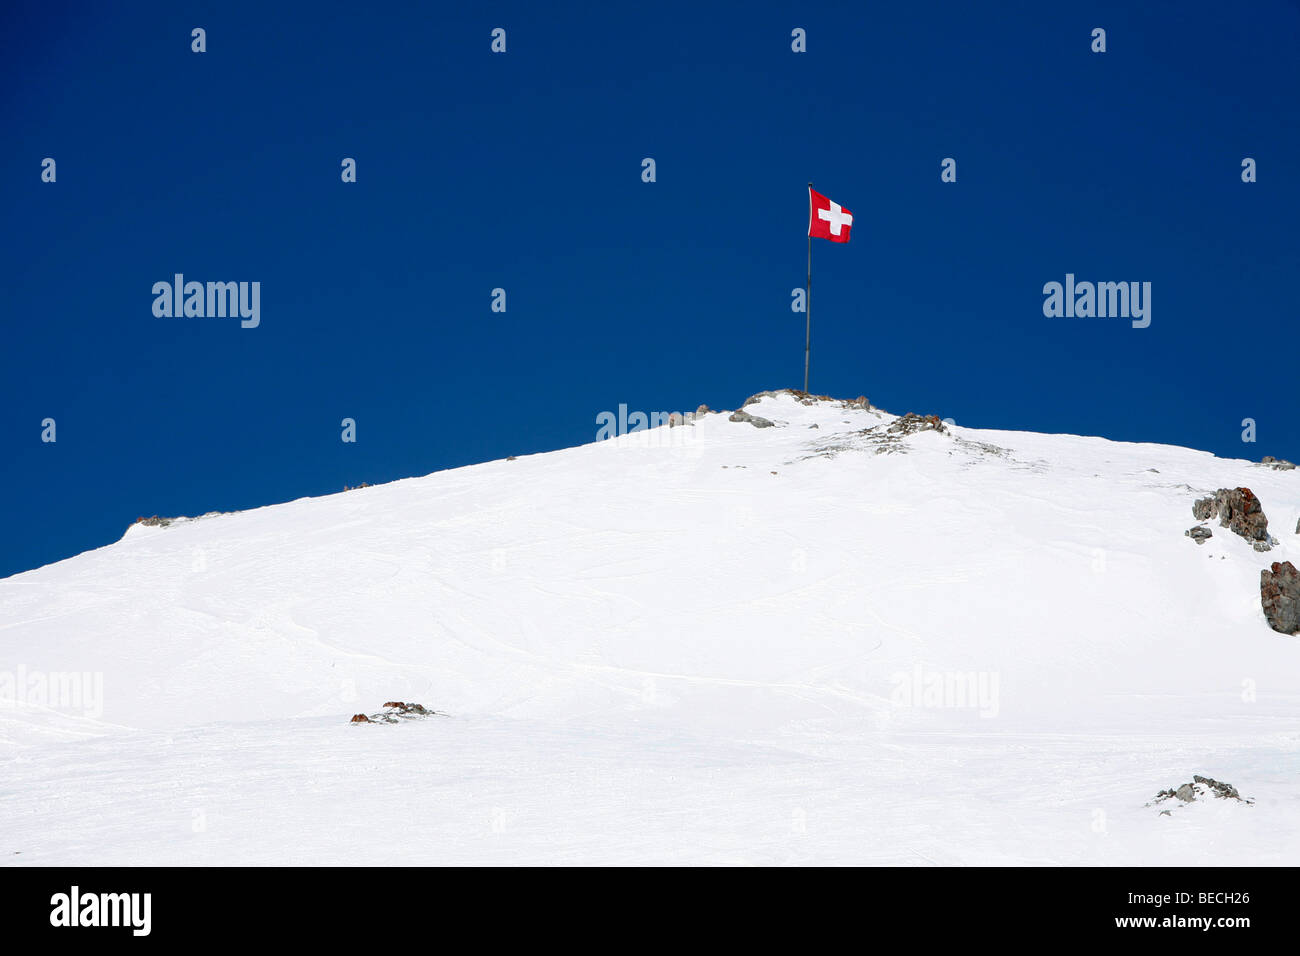 Skiiing, winter sport in the ski area Corviglia, St. Moritz, Oberengadin, Graubuenden, Switzerland - Stock Image